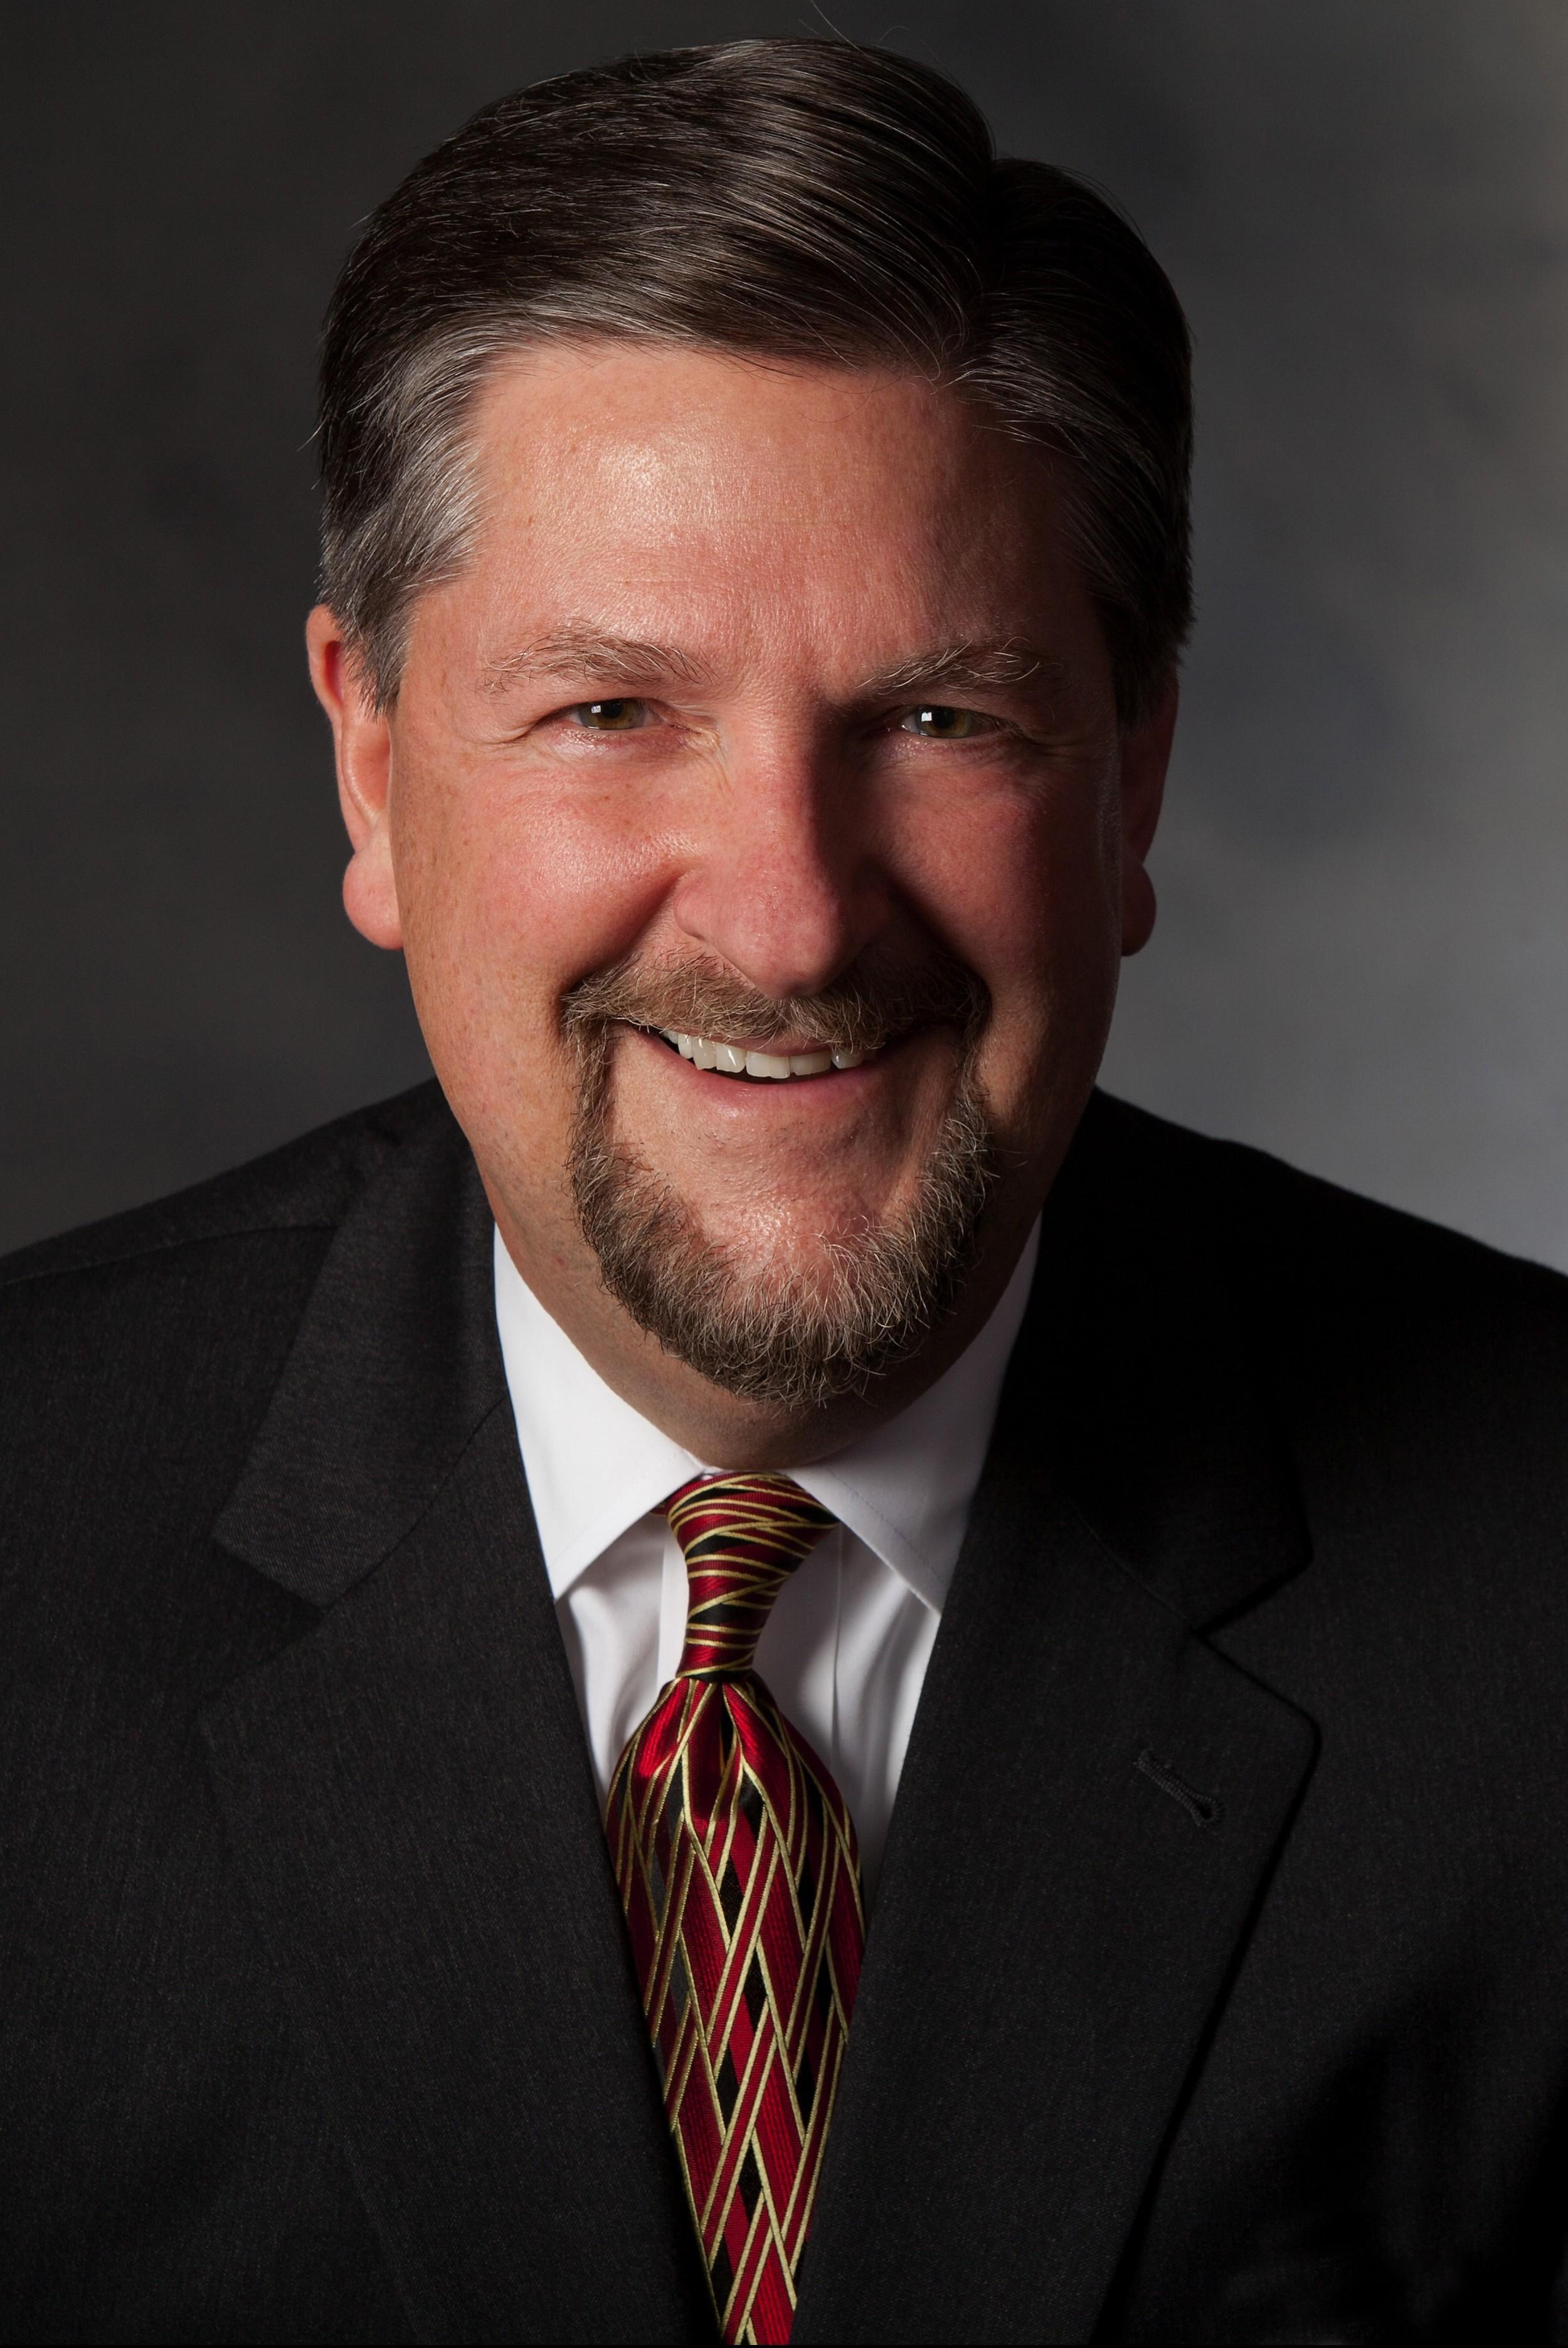 Tom Waltermire, Strategic Adviser at Akron Ascent Innovations